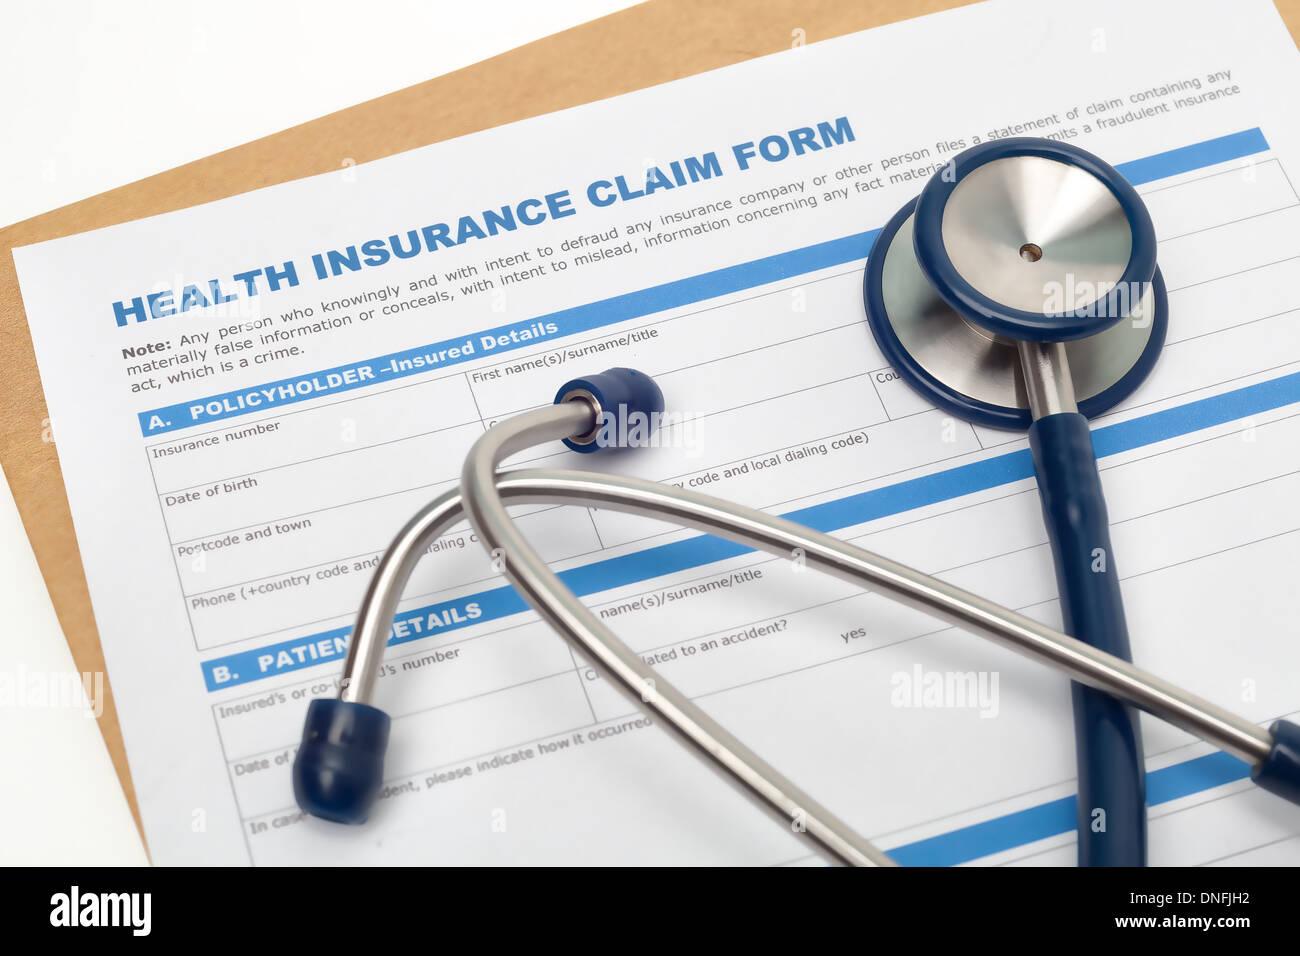 Medical reimbursement with health insurance claim form and stethoscope - Stock Image